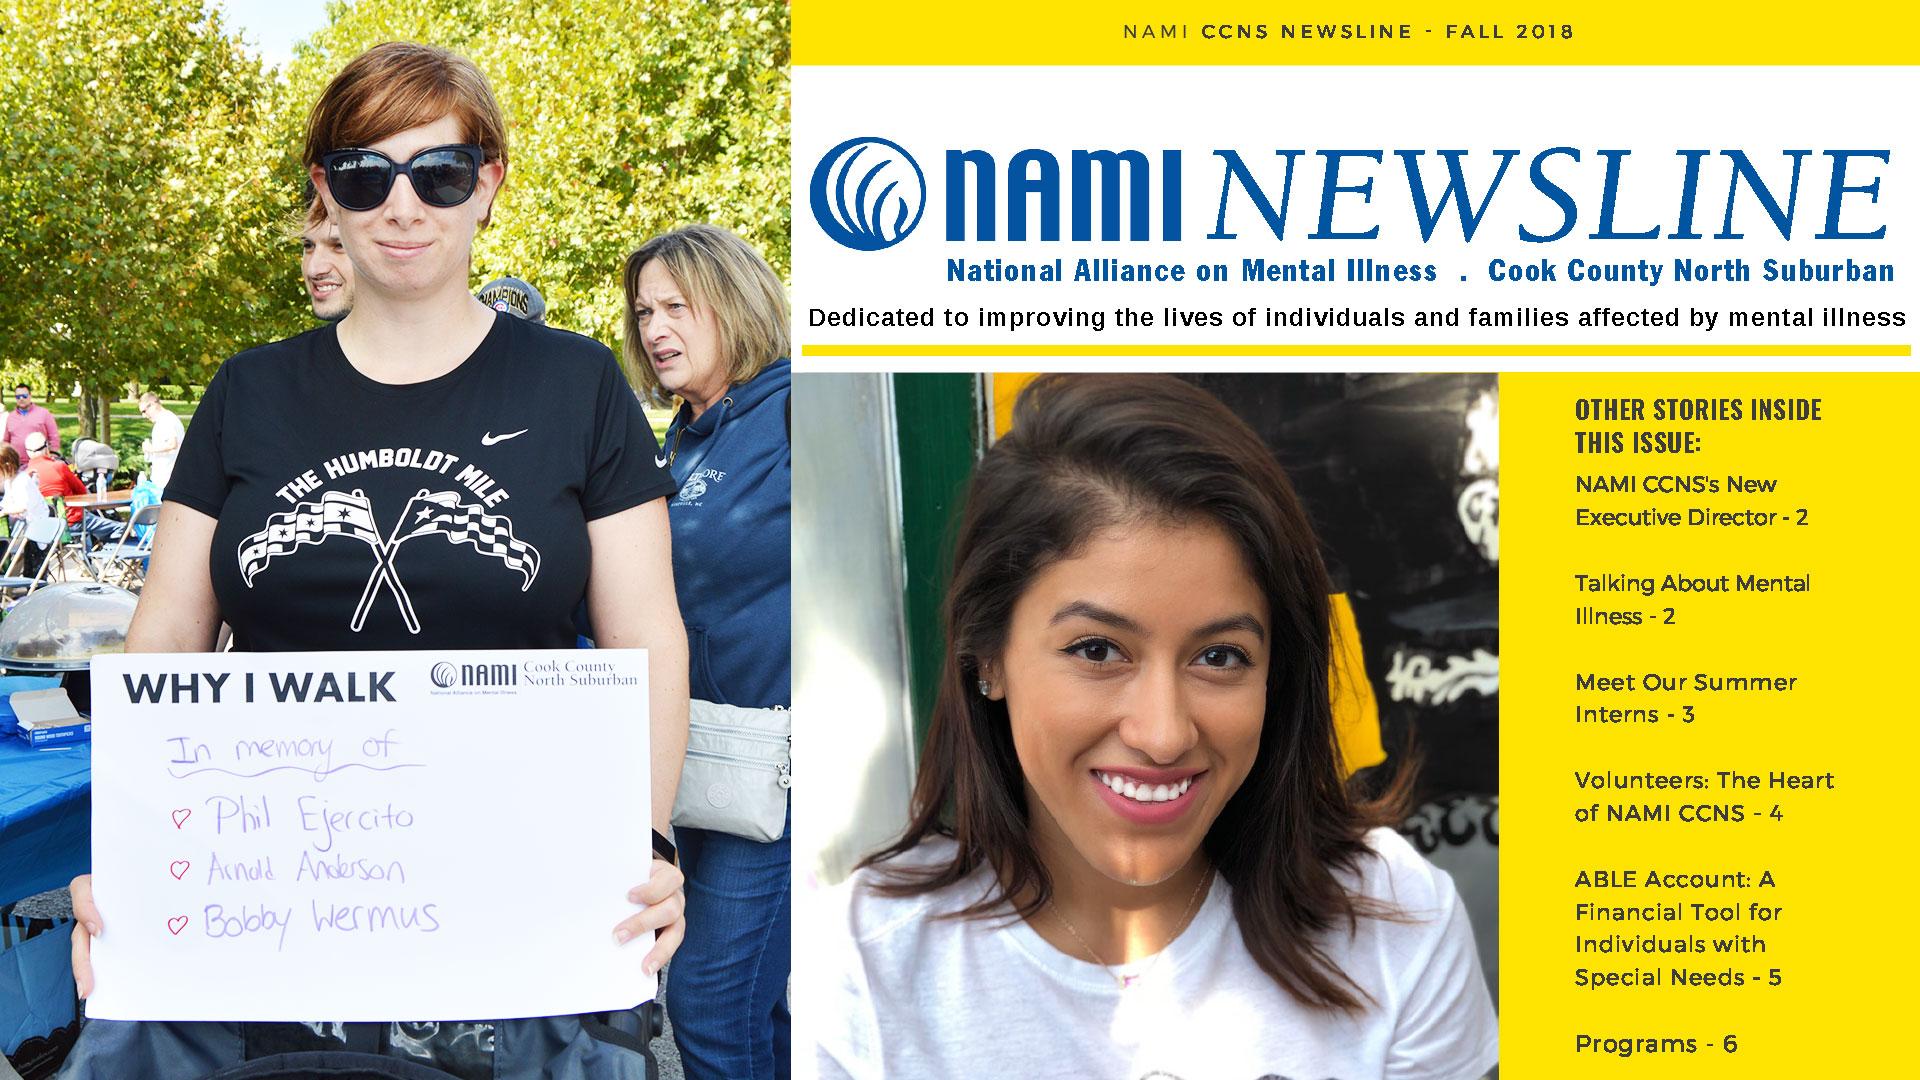 2018 NAMI NEWSLINE FALL